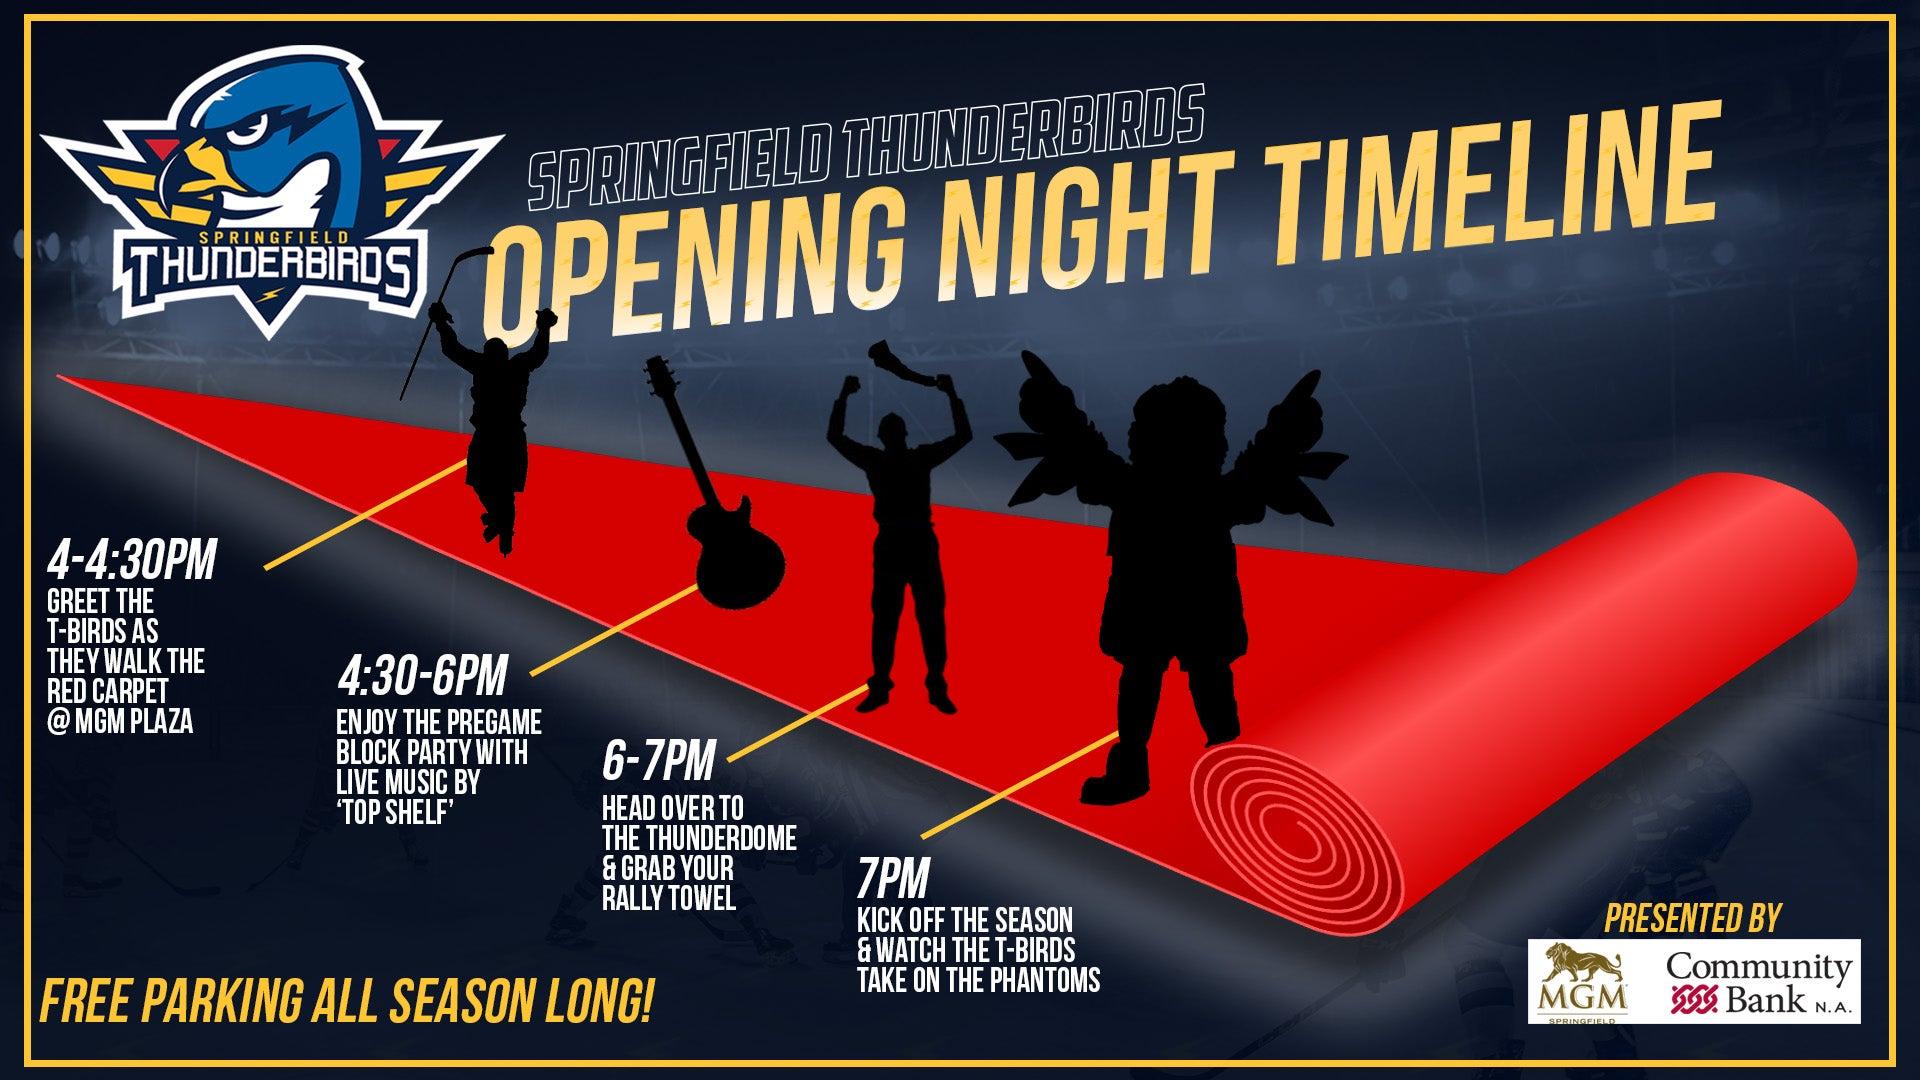 Opening Night Timeline.jpg